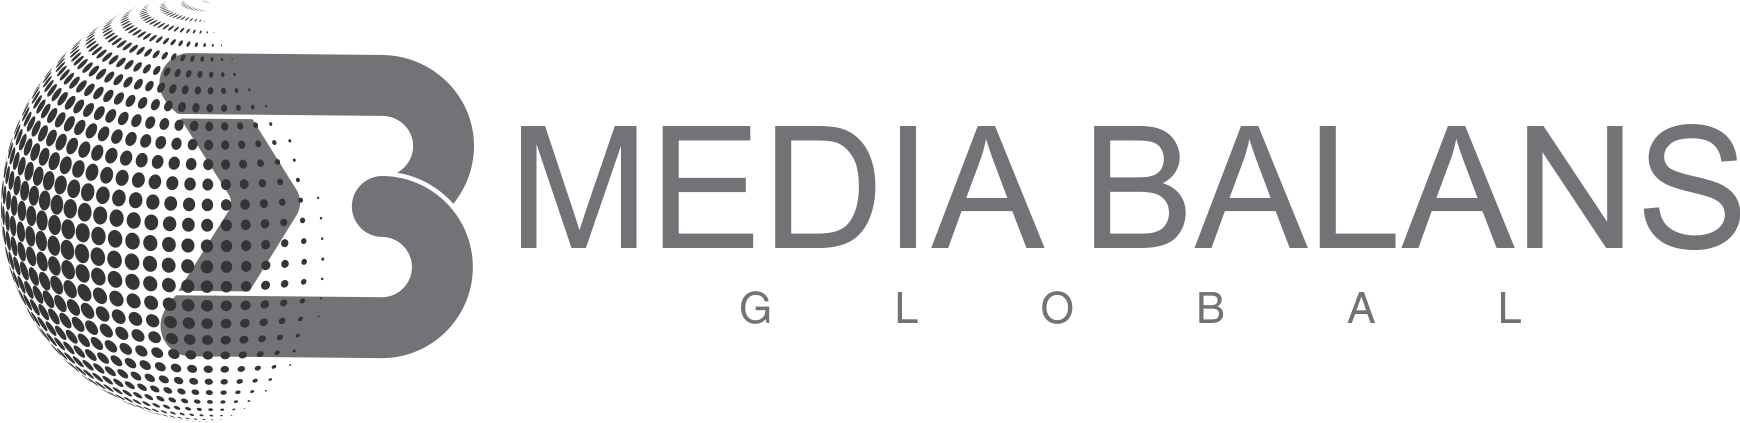 mediabalans logo black